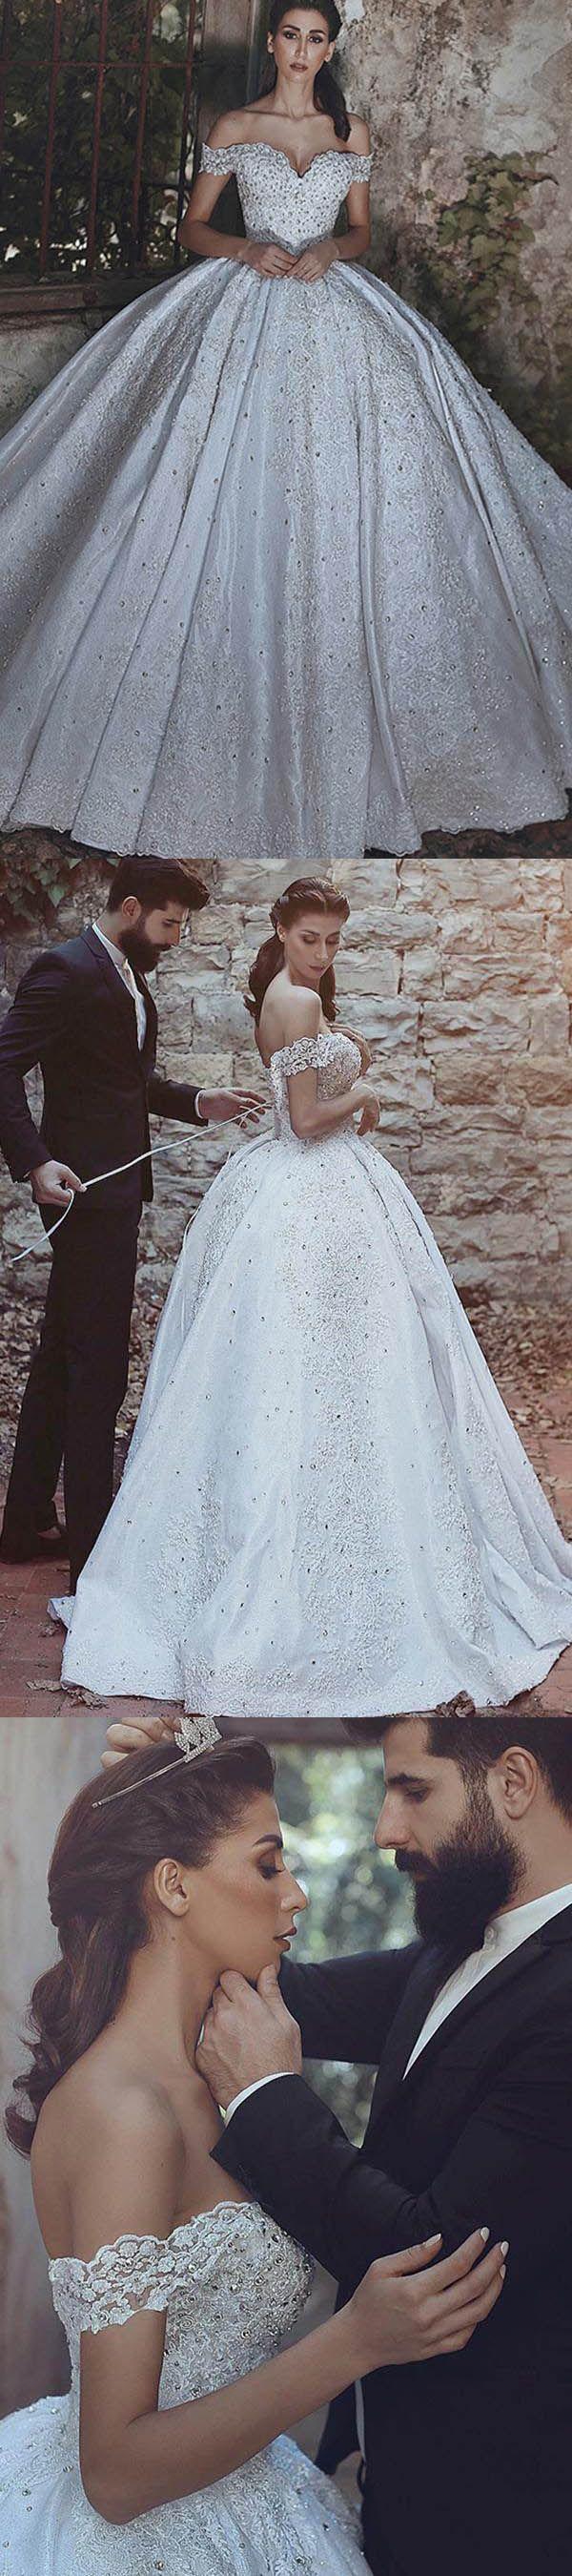 Ball Gown Off-the-Shoulder Court Train Ivory Satin Wedding Dress WD204 #weddings #wedding #dress